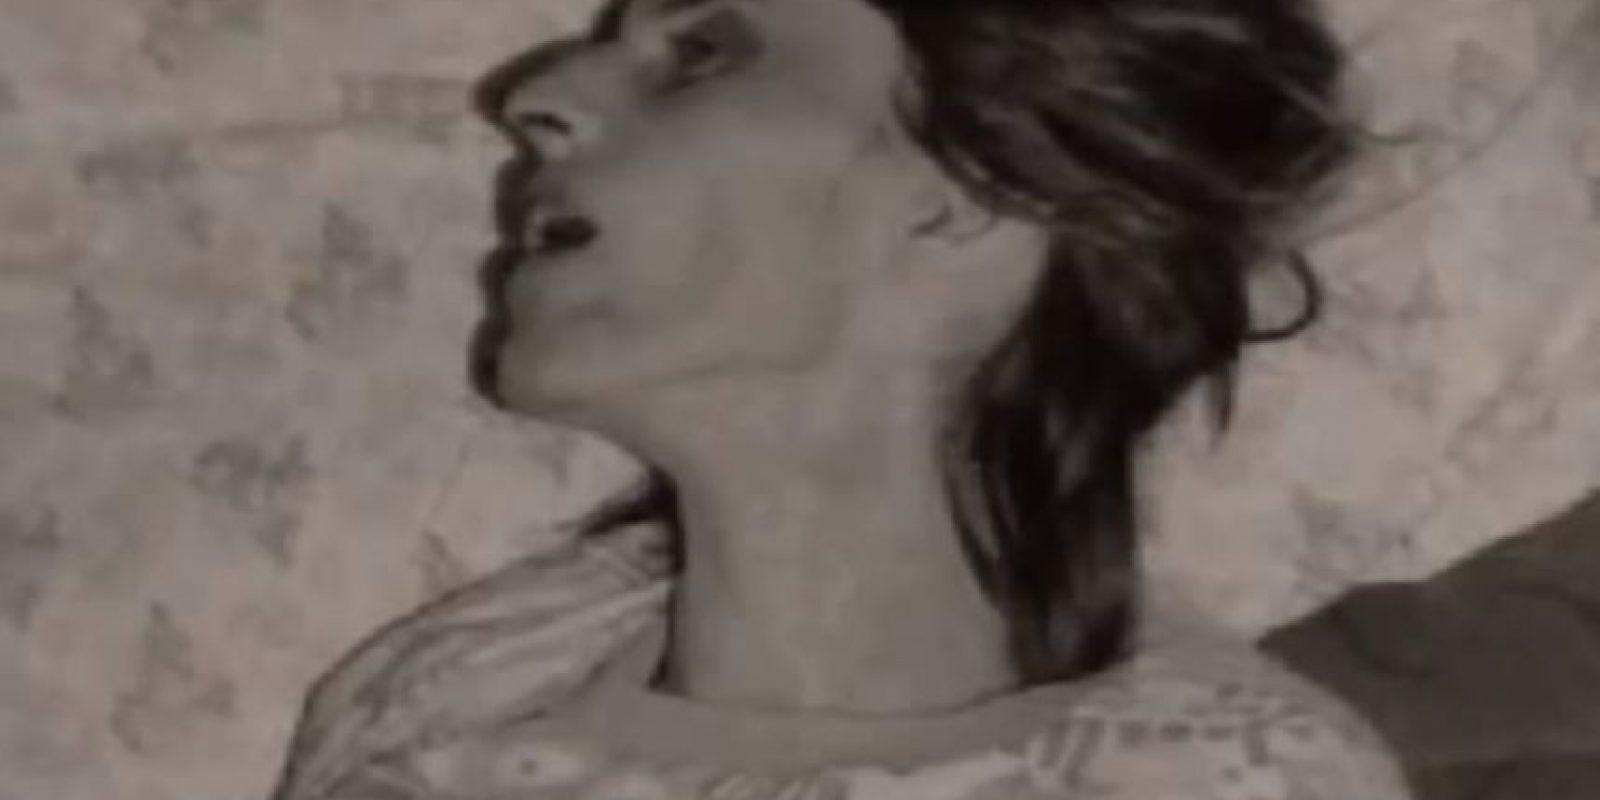 Sus padres realizaron un exorcismo que duró 10 meses Foto:IMDB